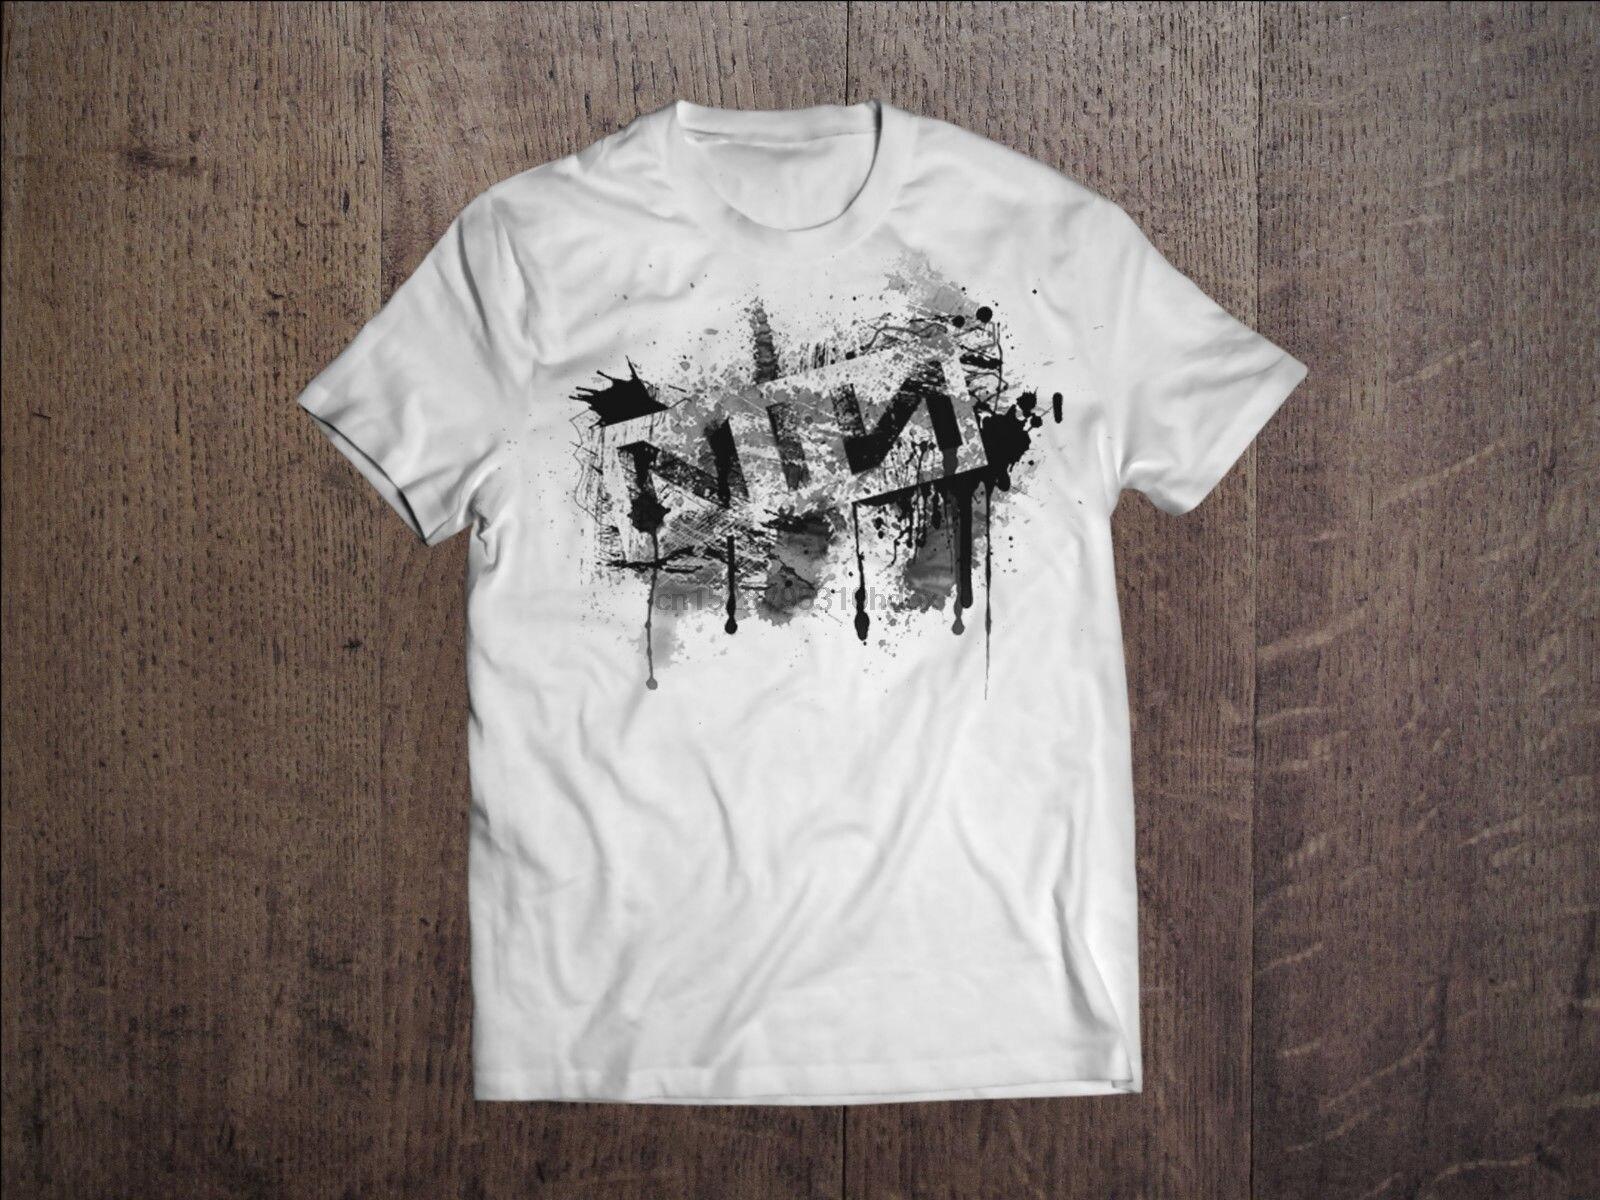 Like NIN The Slip T-SHIRT male female all sizes Nine Inch Nails SHIRT TEE TOP